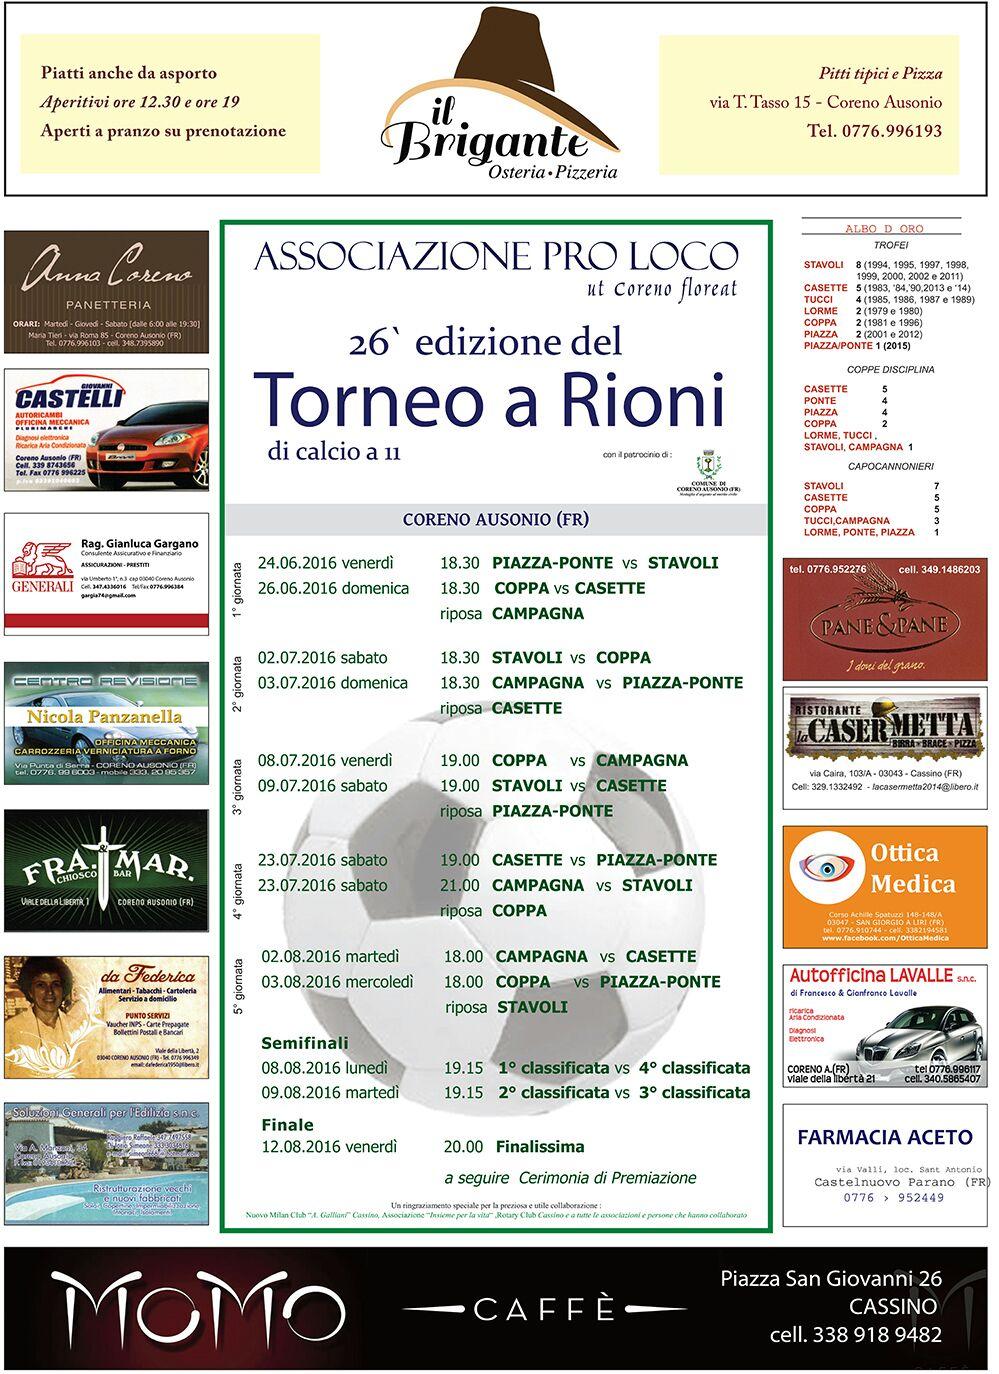 Calendario torneo a rioni 2016